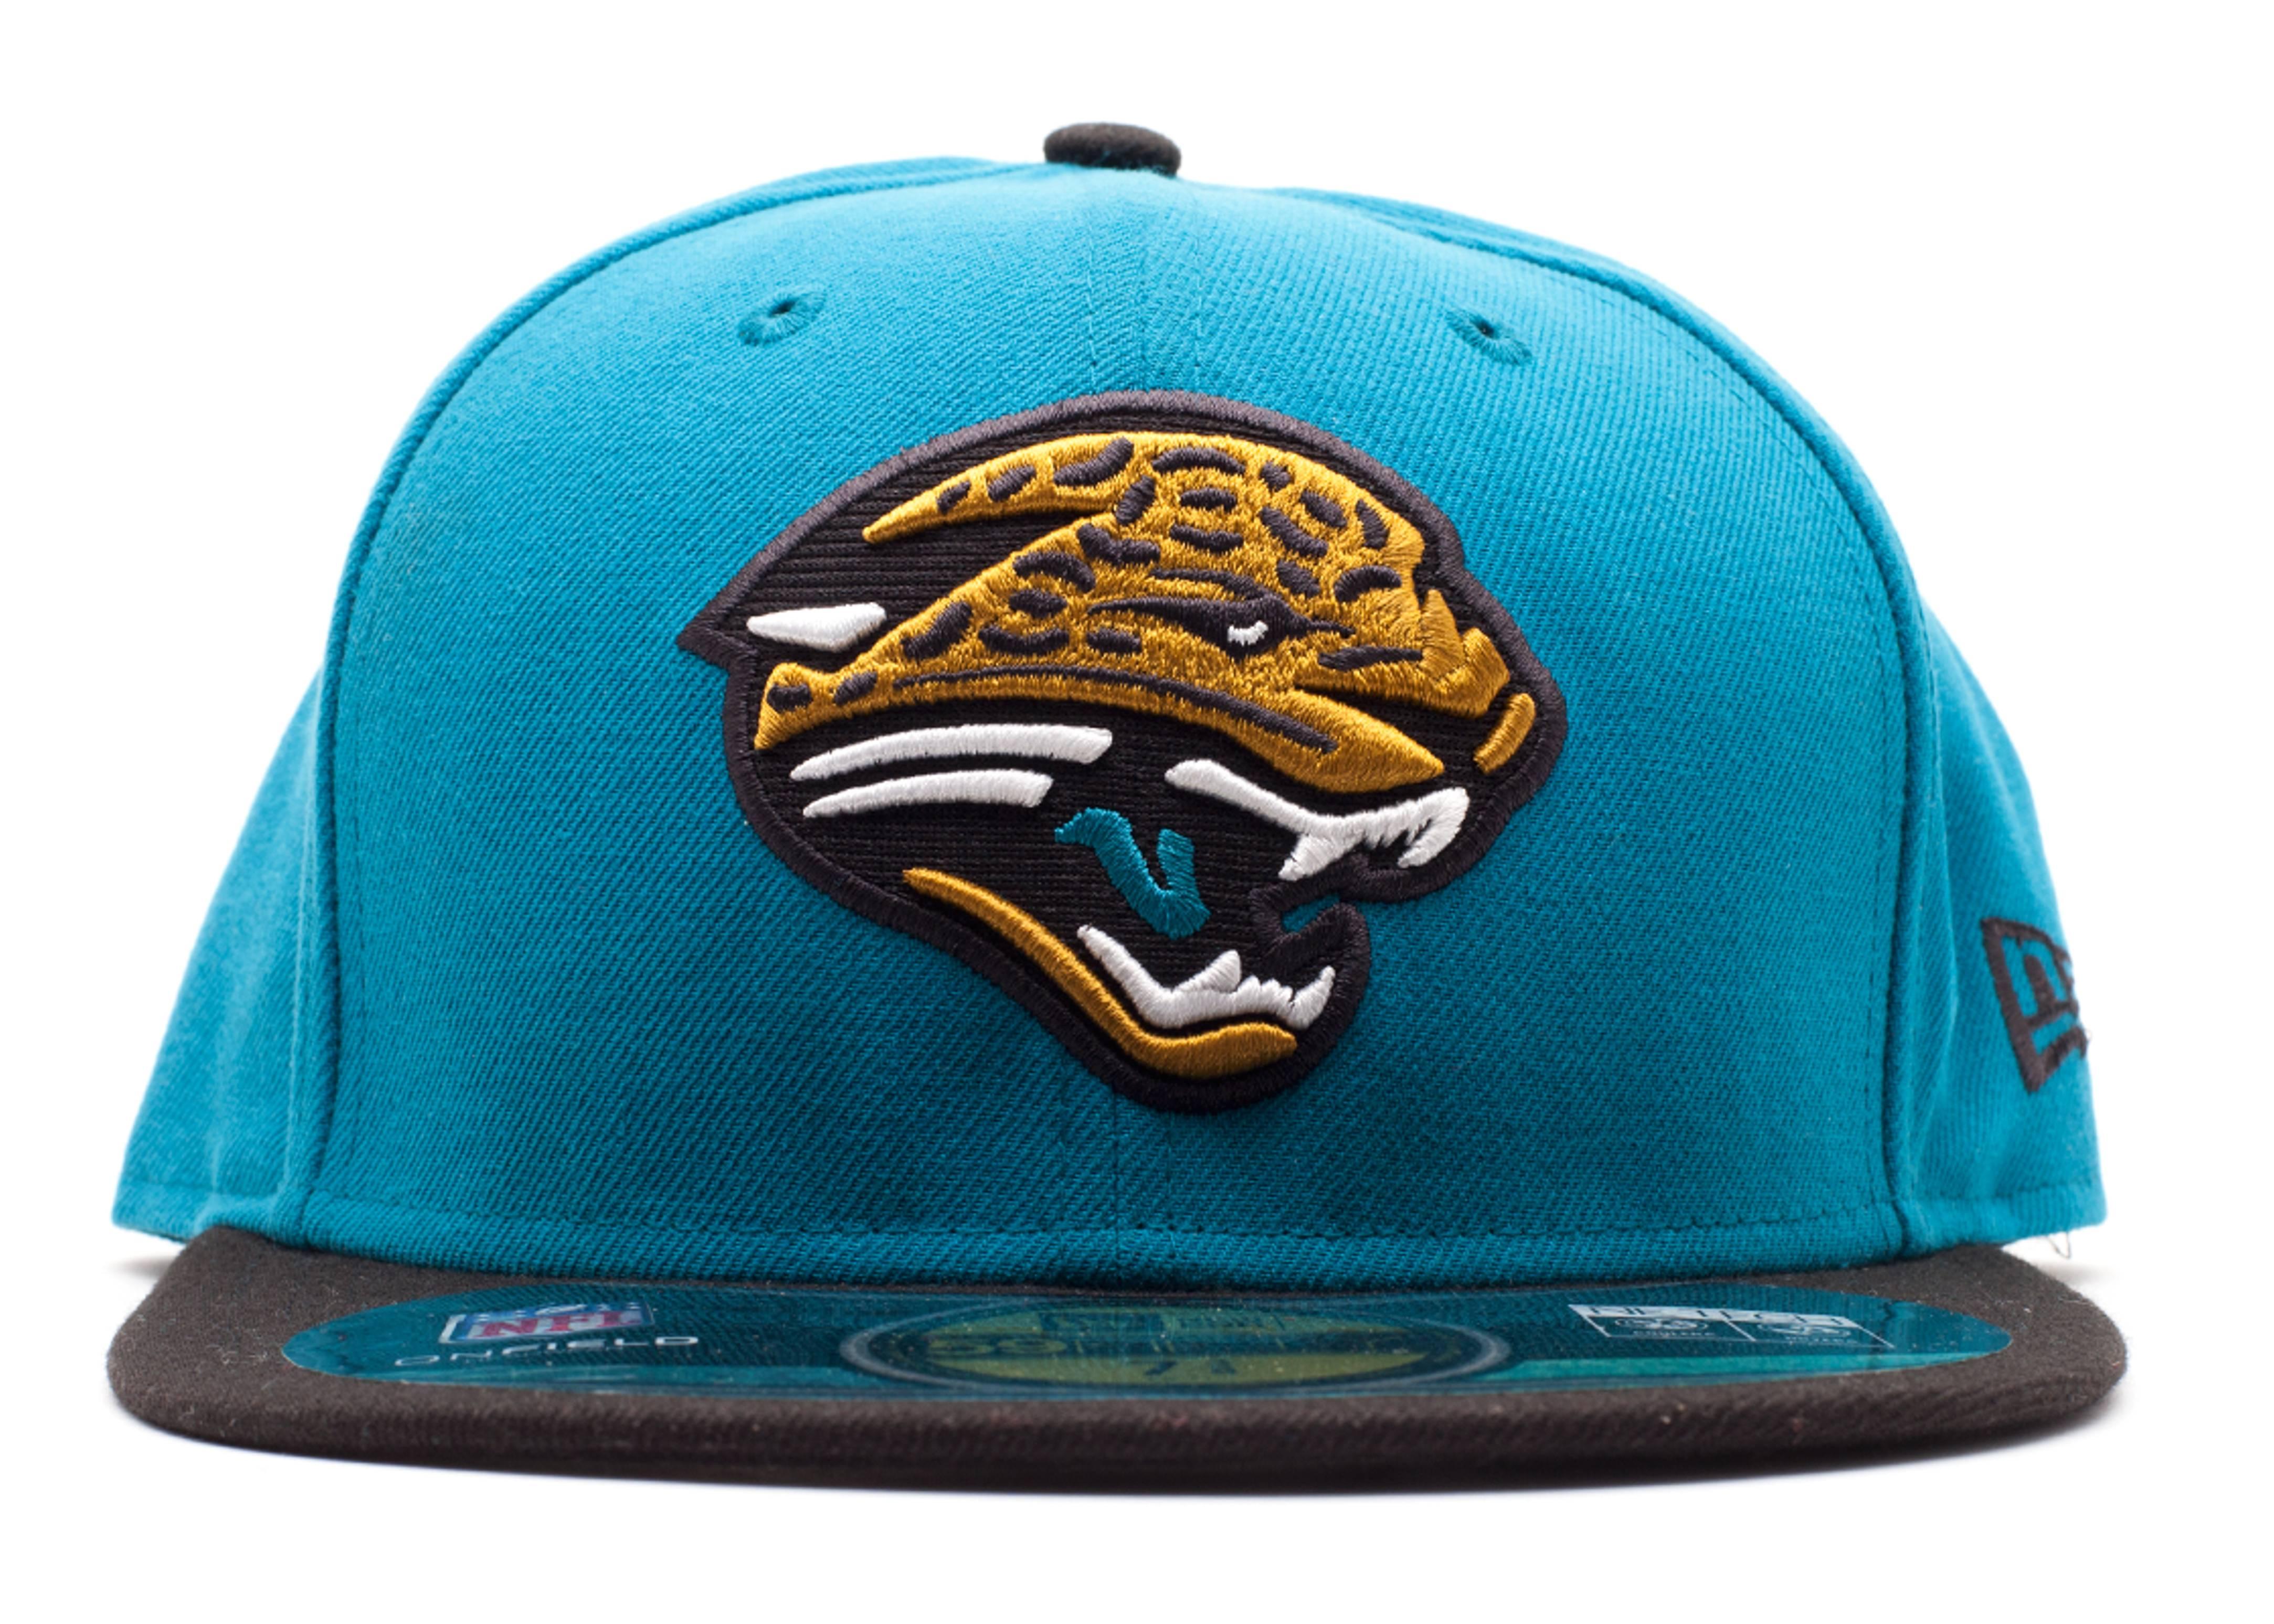 jacksonville jaguars fitted